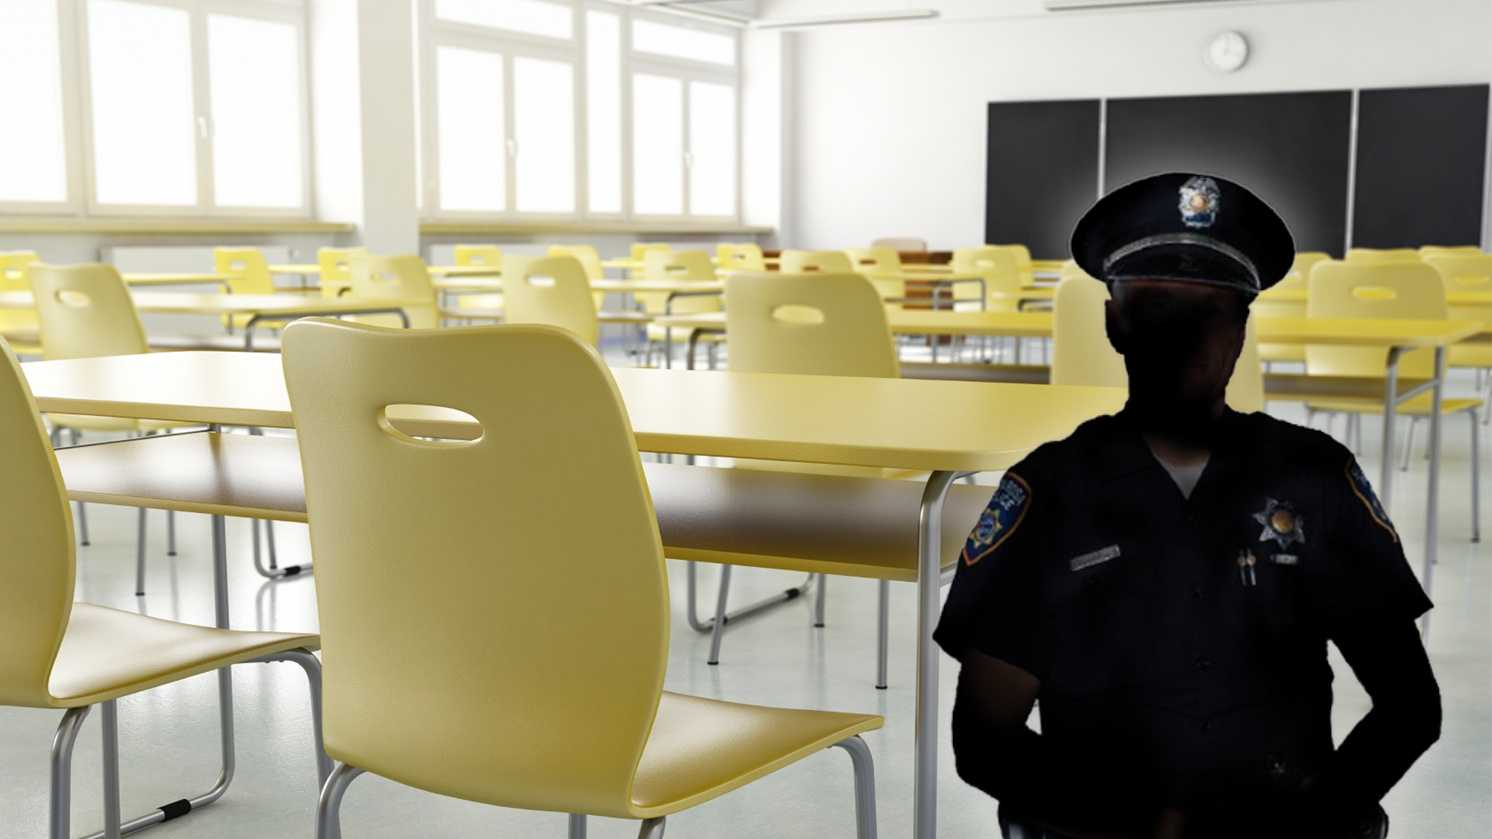 School police investigation